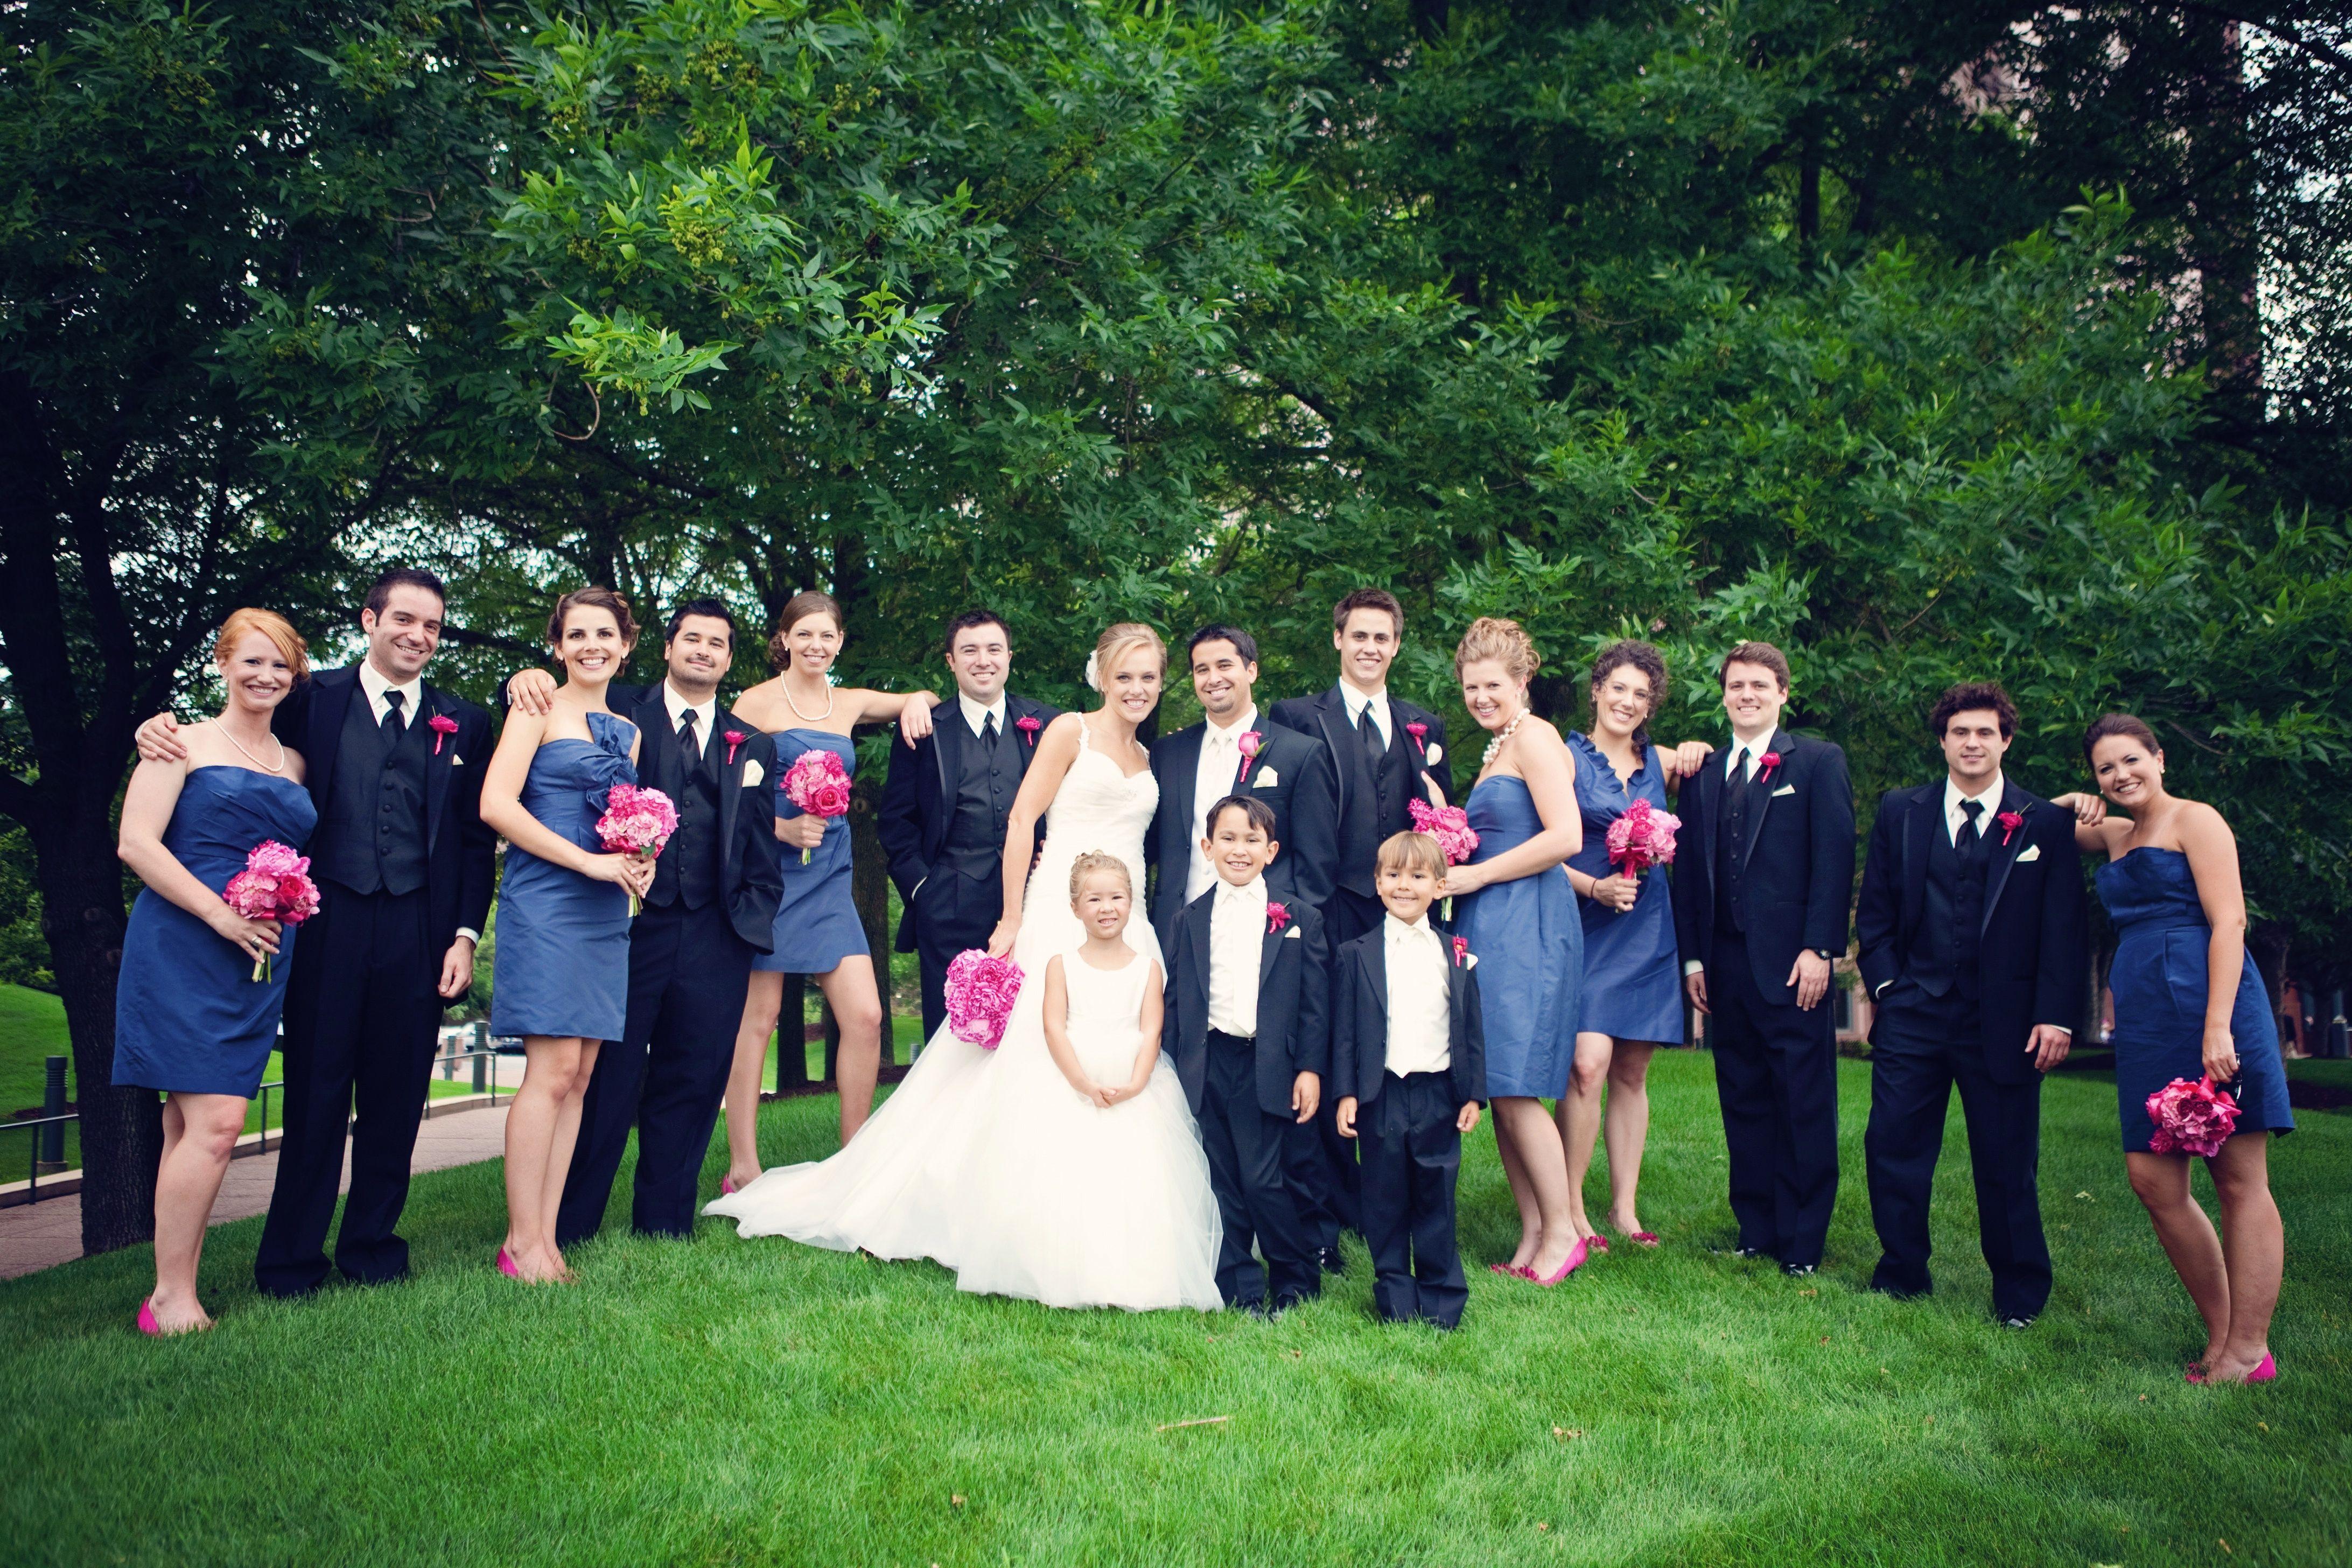 Caspian blue bridesmaid dresses